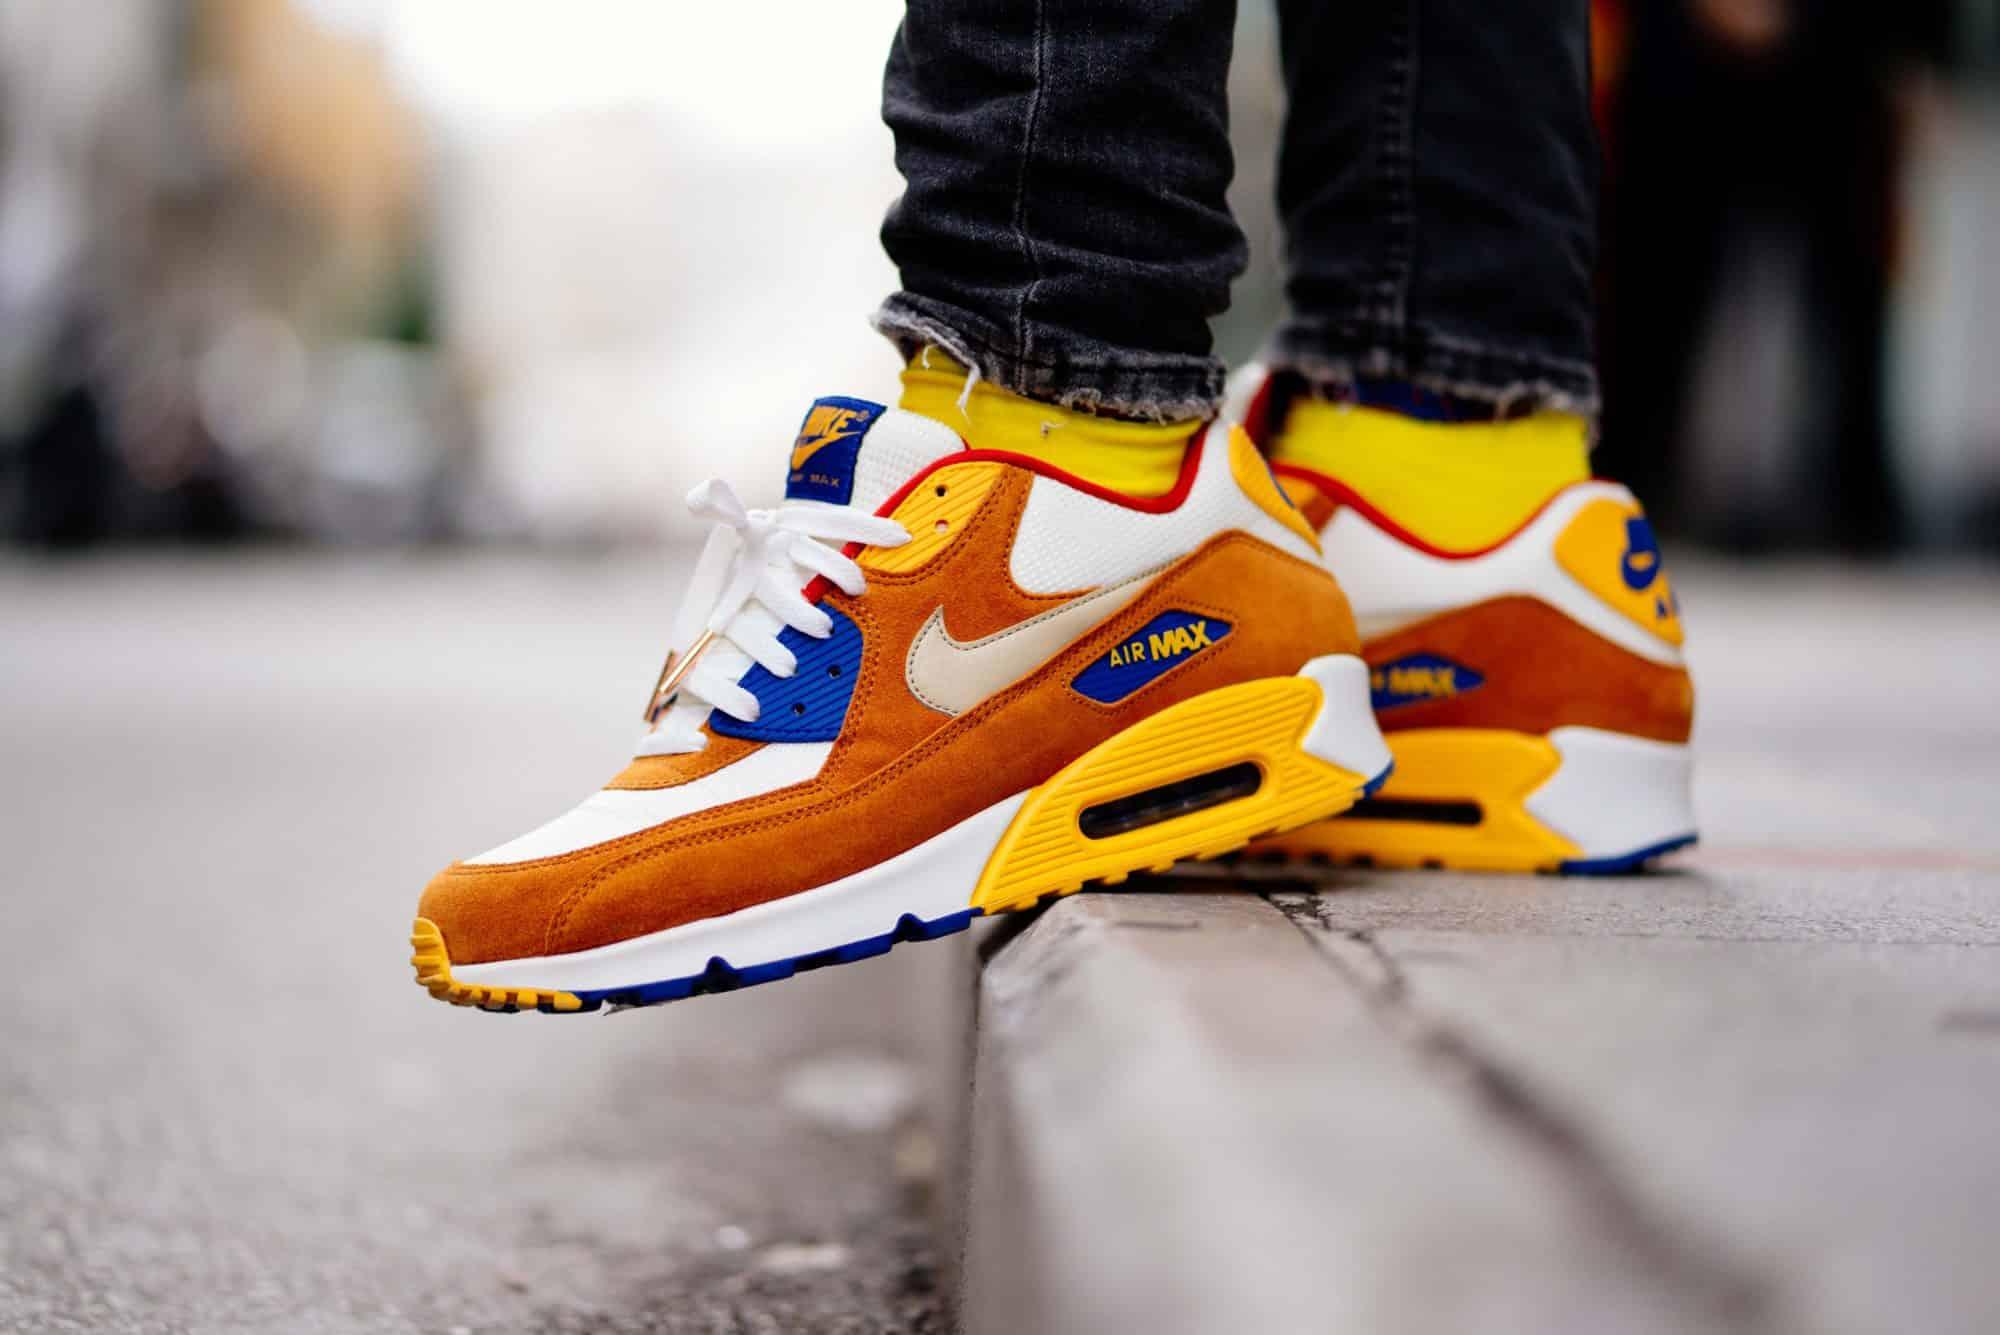 sneakers-tendance-2021